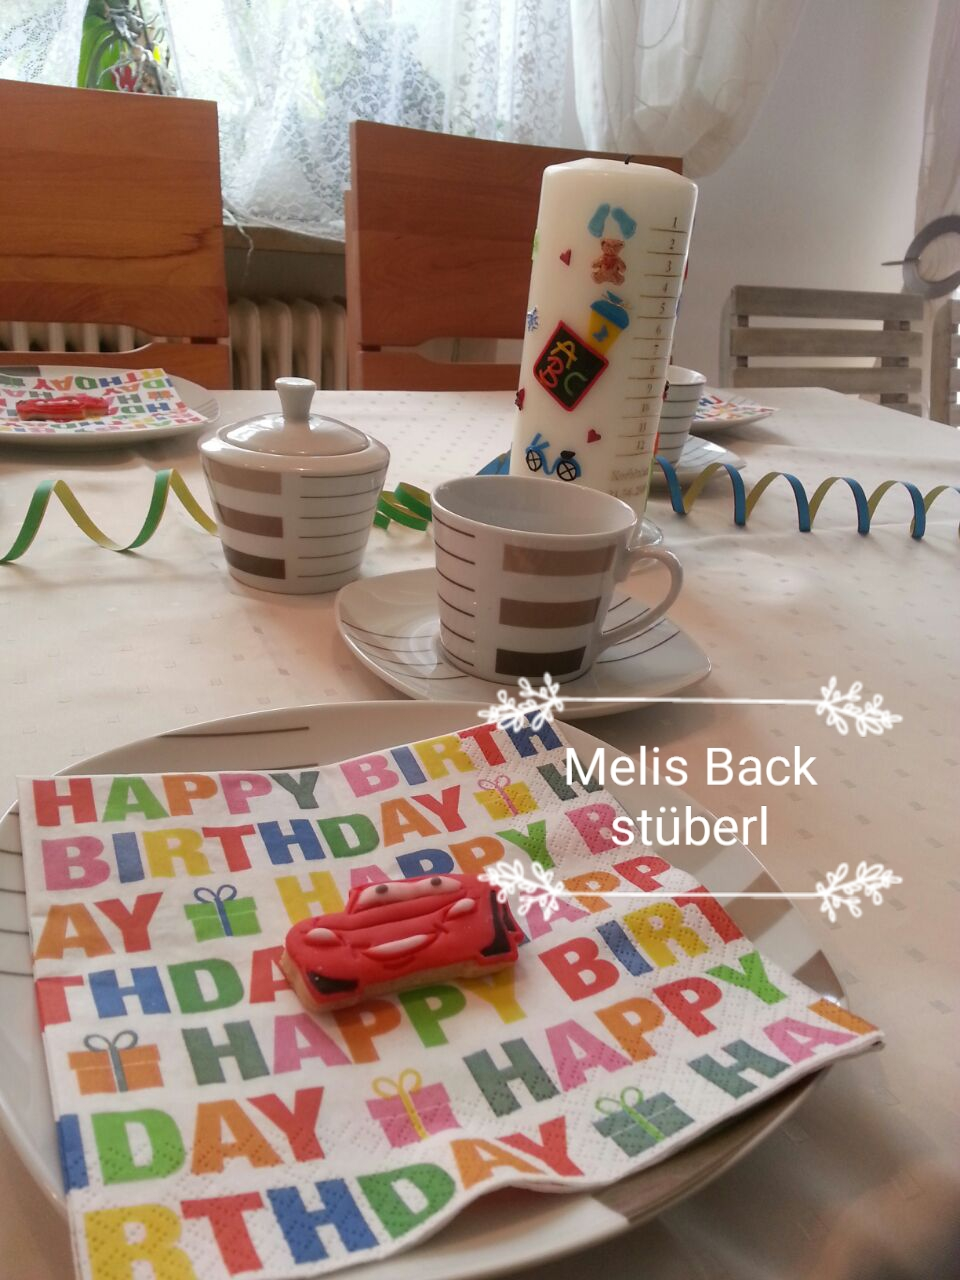 Melis backst berl kekse dekorieren lightning mcqueen von cars - Kekse dekorieren ...